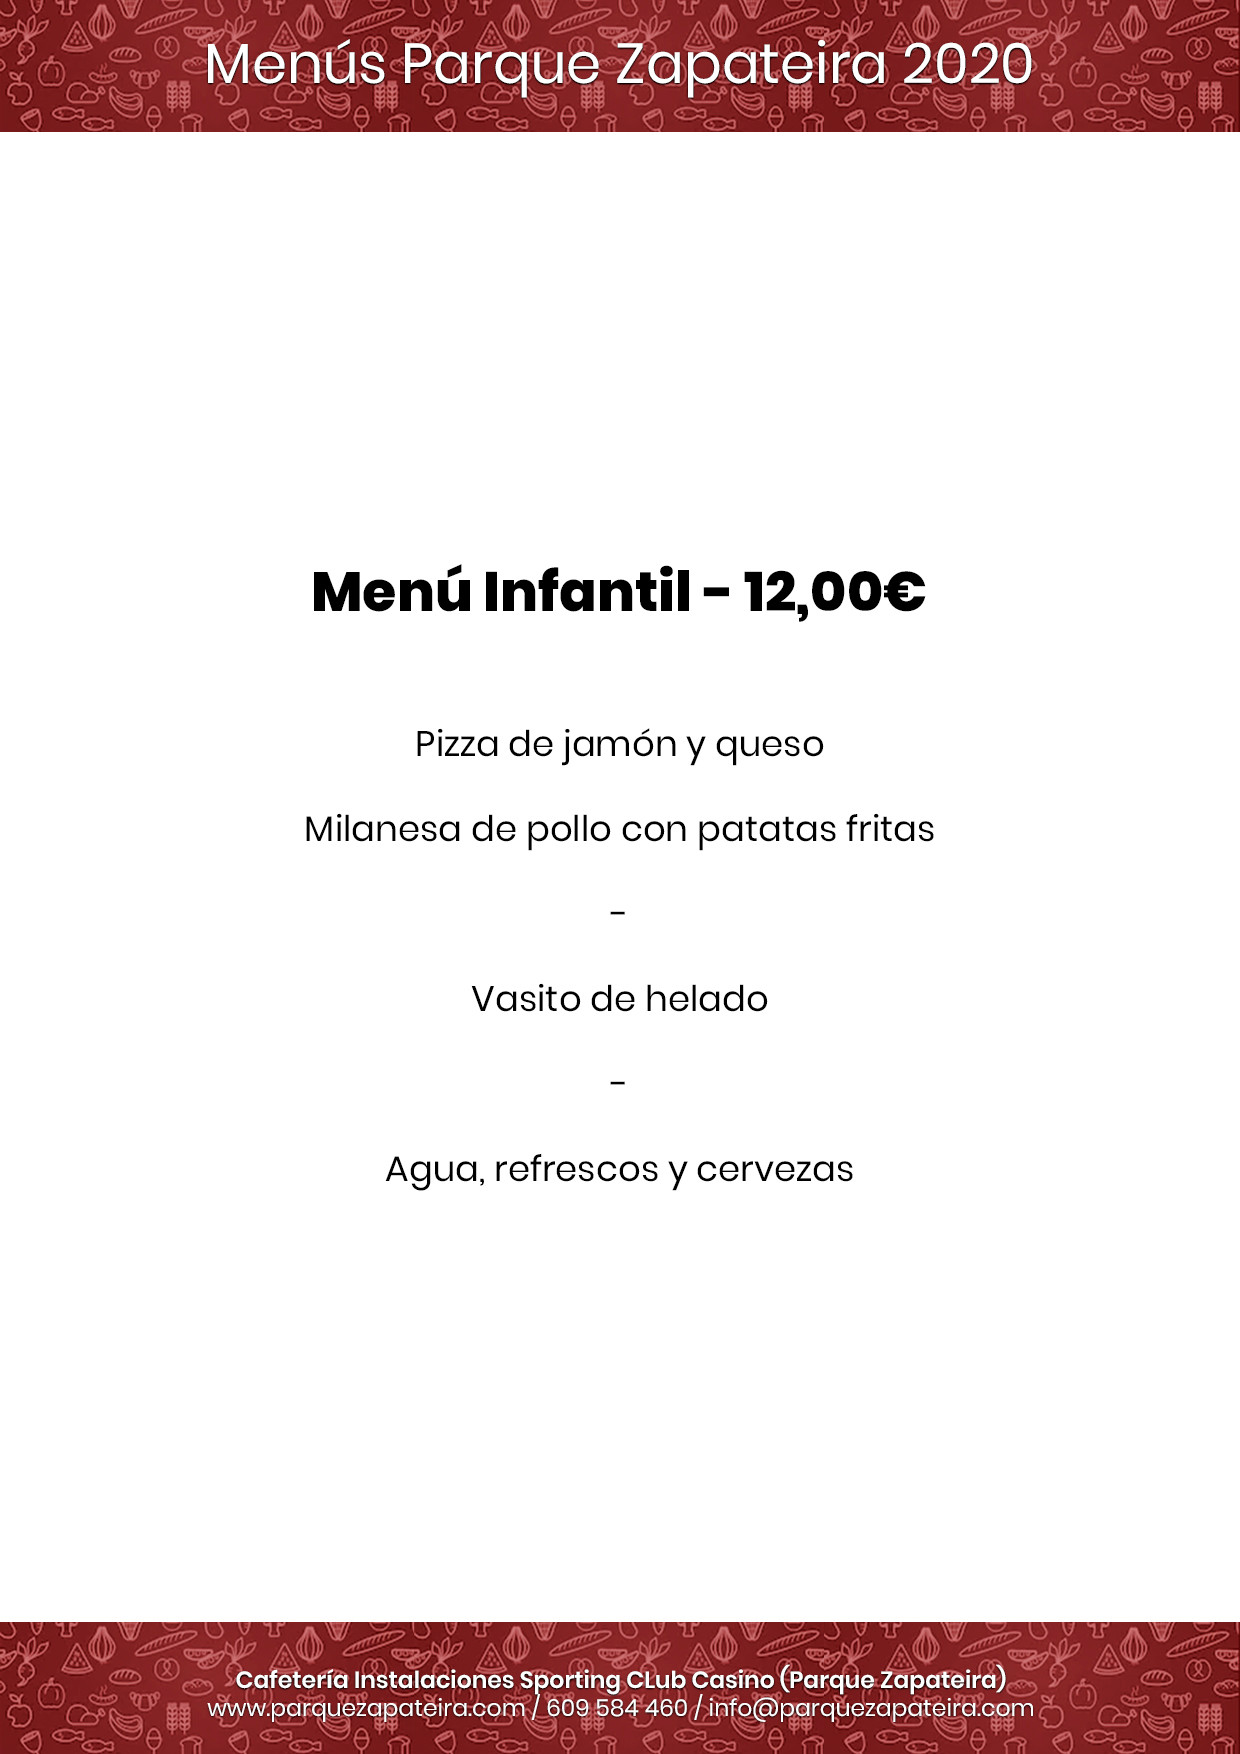 menusgrupos2020-Infantil.jpg